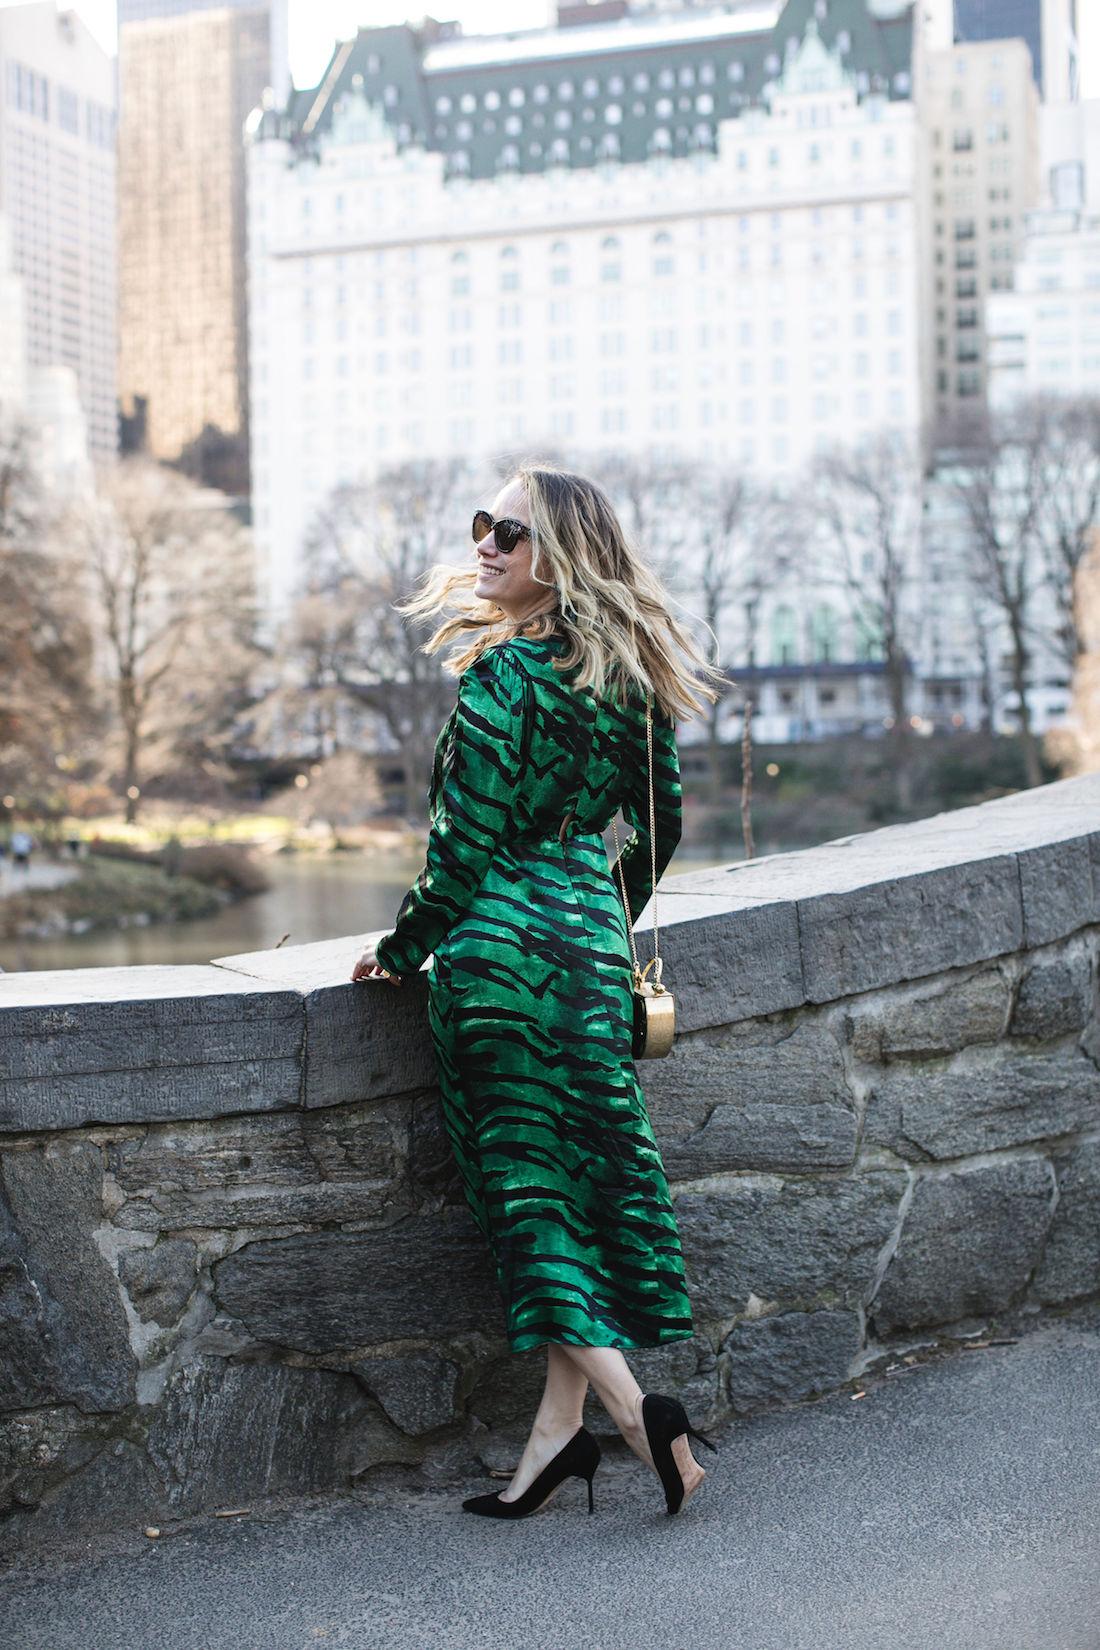 Outfit Details: Topshop Dress // Manolo Blahnik Pumps // Okhtein Bag // Kendra Scott Earrings // Polaroid Sunglasses